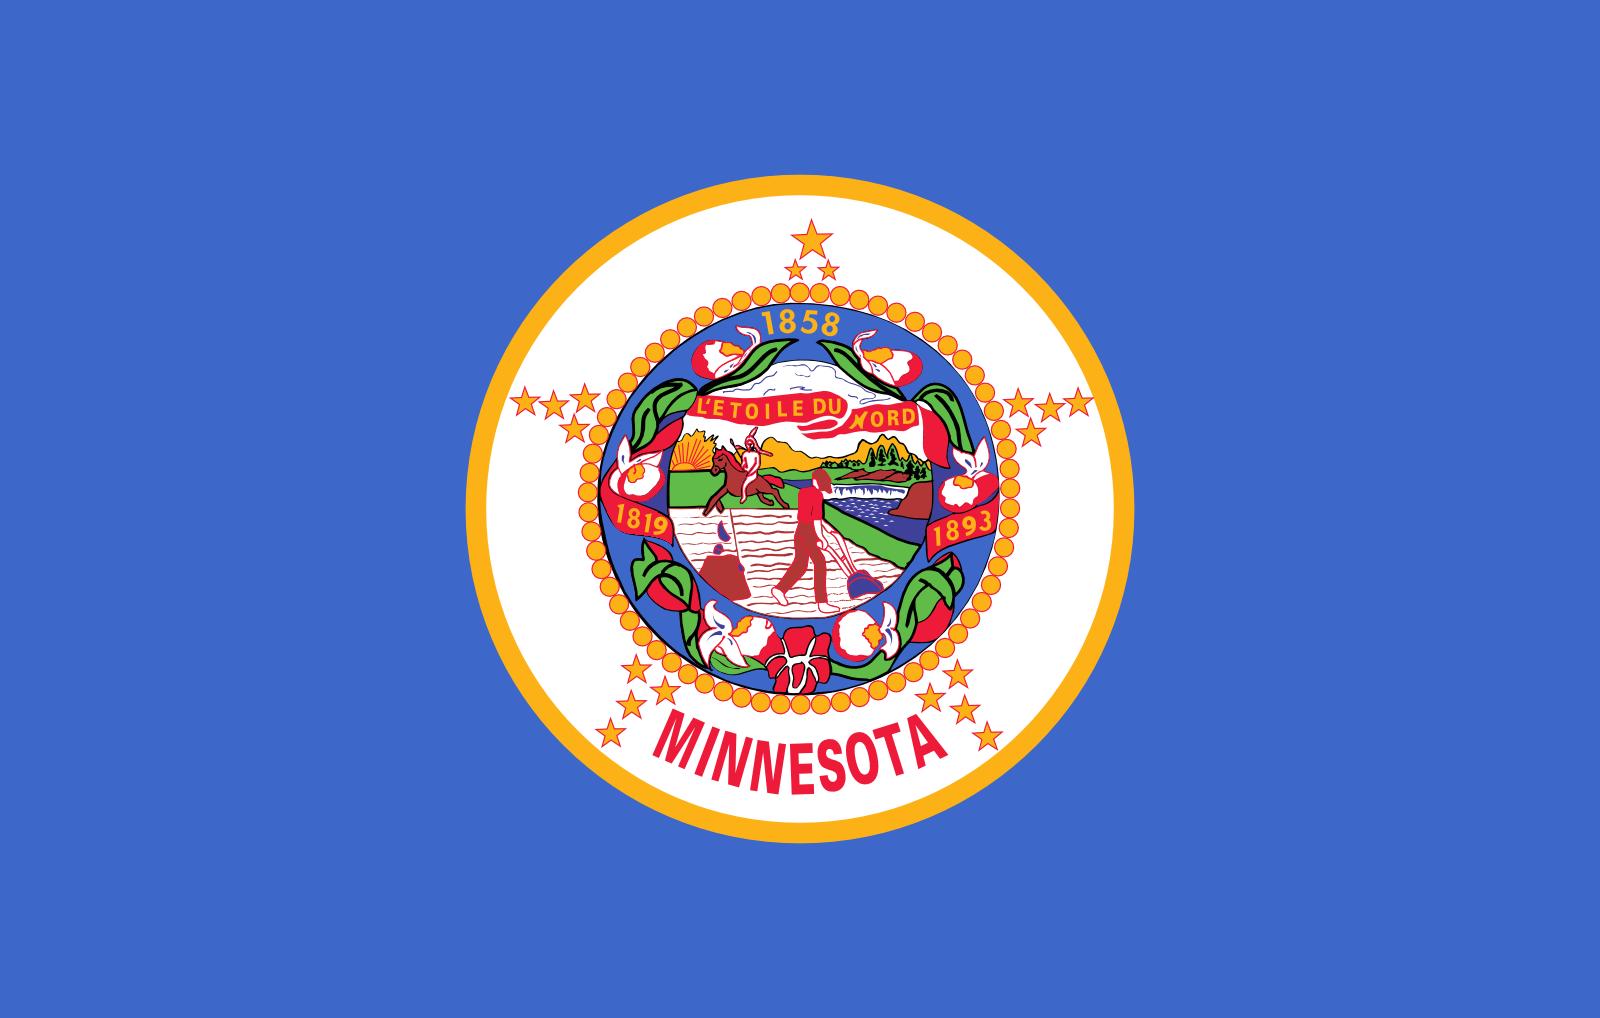 Who is the patron saint of Minnesota?